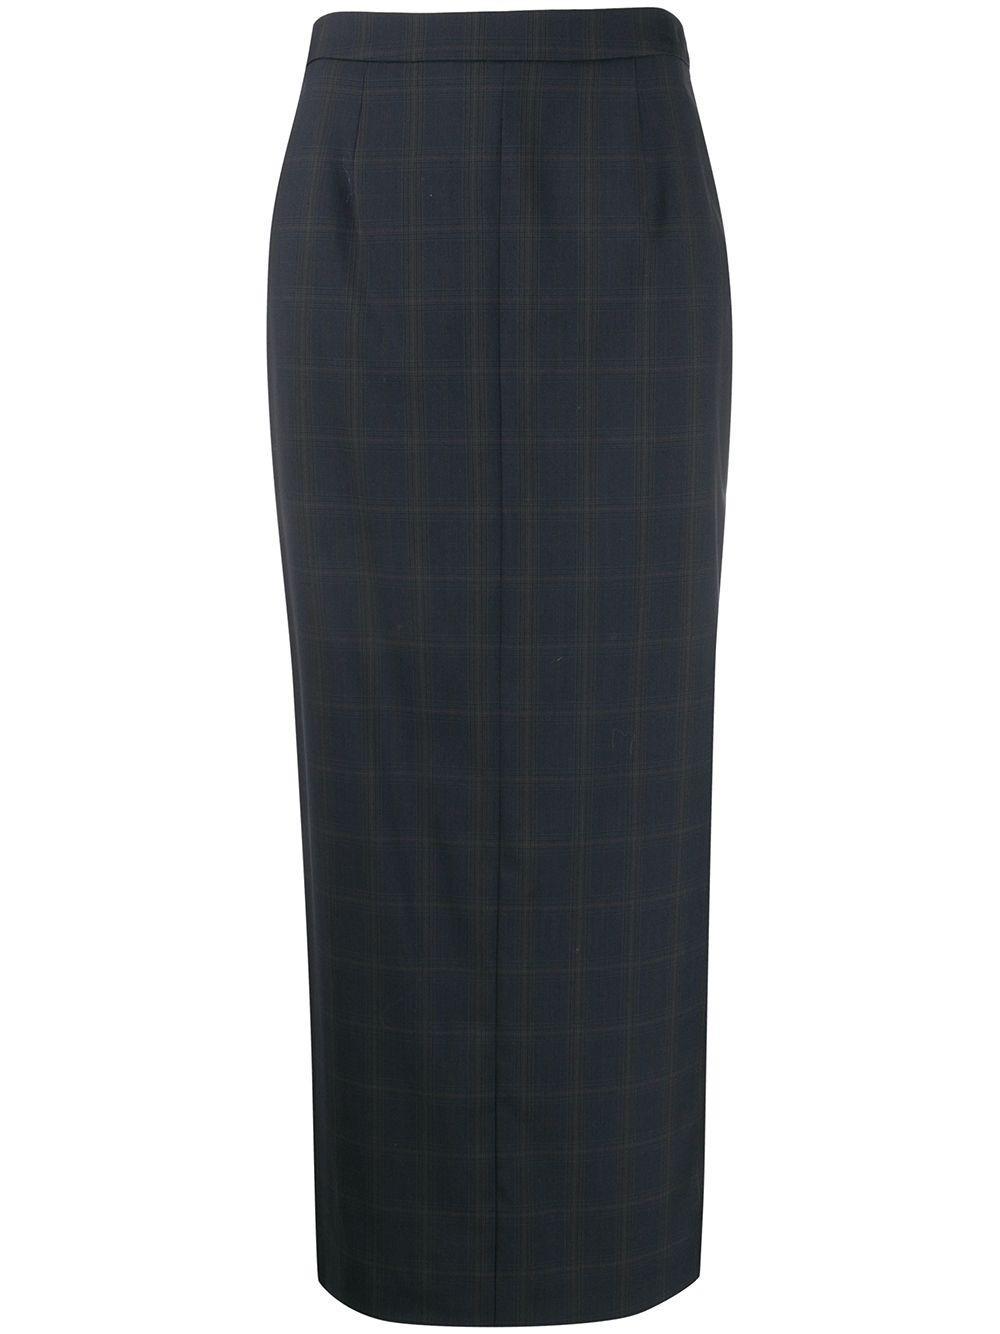 Maison Margiela длинная юбка-карандаш в клетку